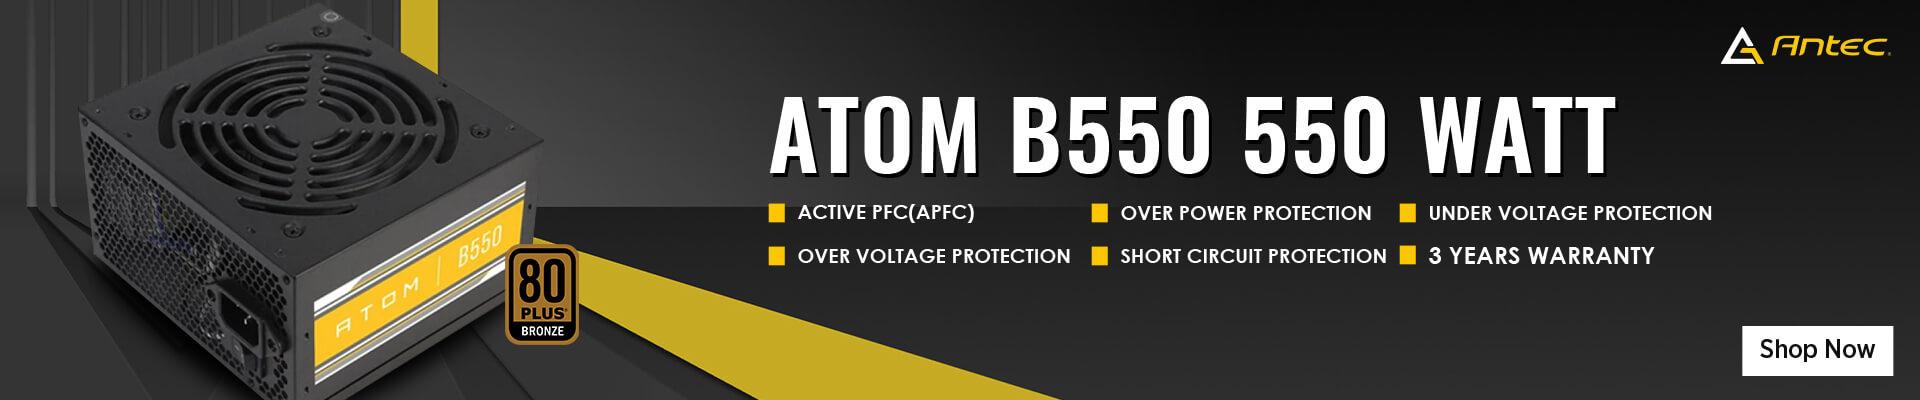 Antec ATOM B550 550 Watt 80 Plus Bronze